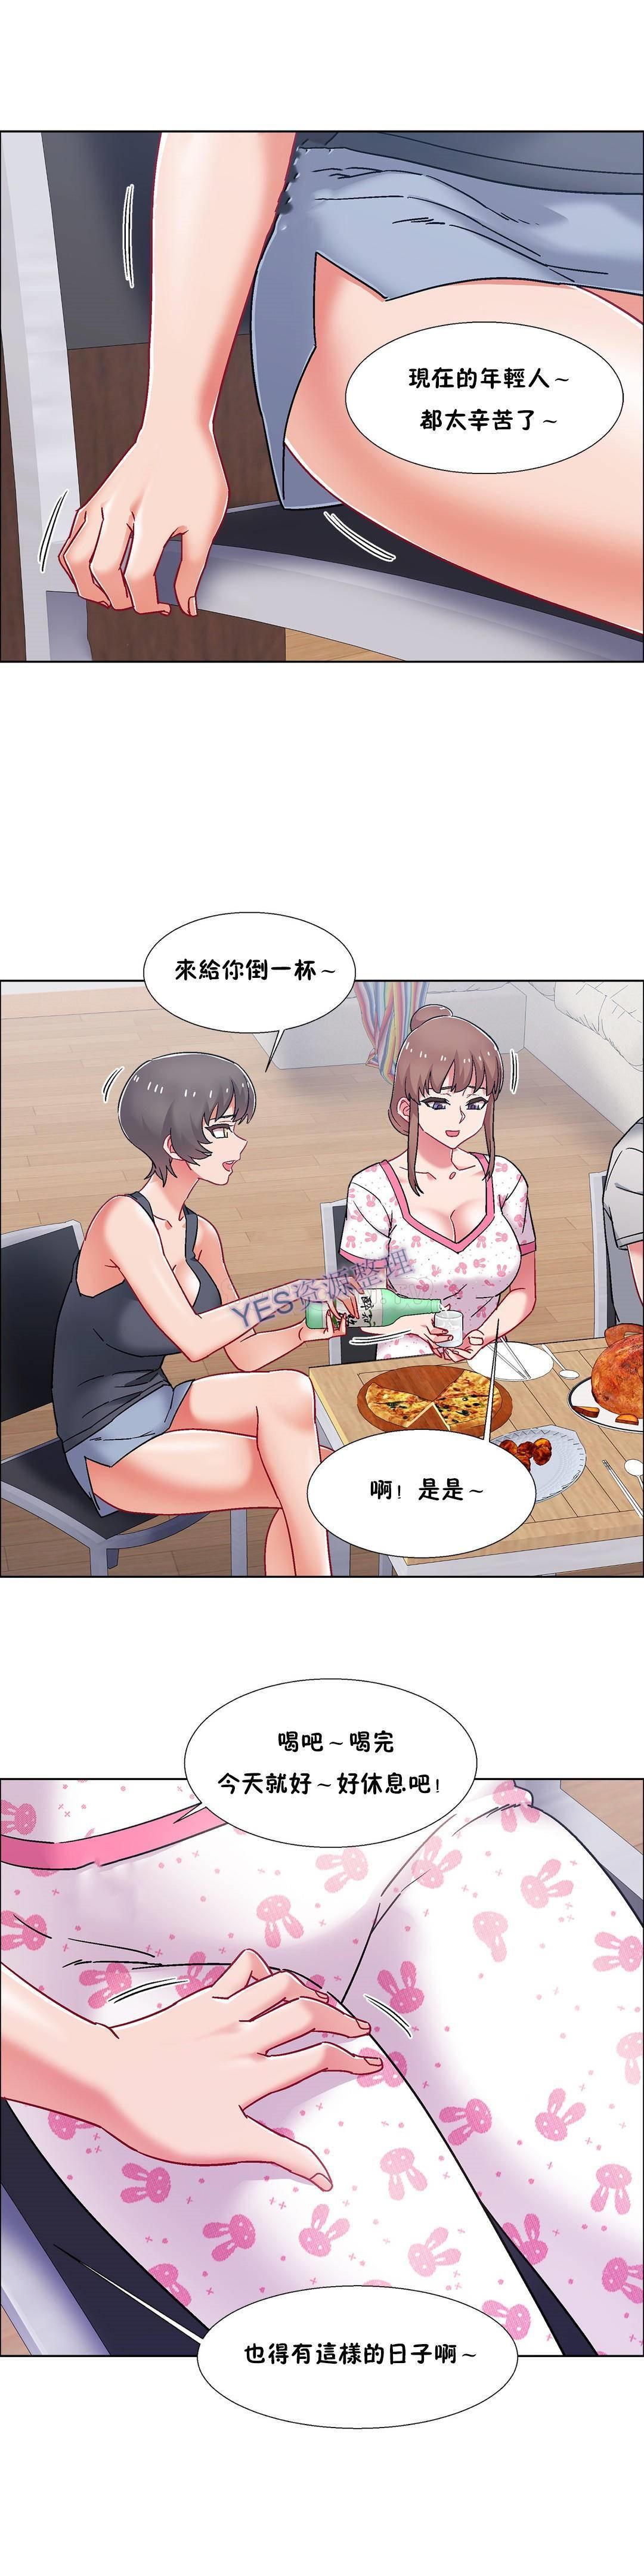 [Studio Wannabe] Rental Girls | 出租女郎 Ch. 33-58 [Chinese]  第二季 完结 544